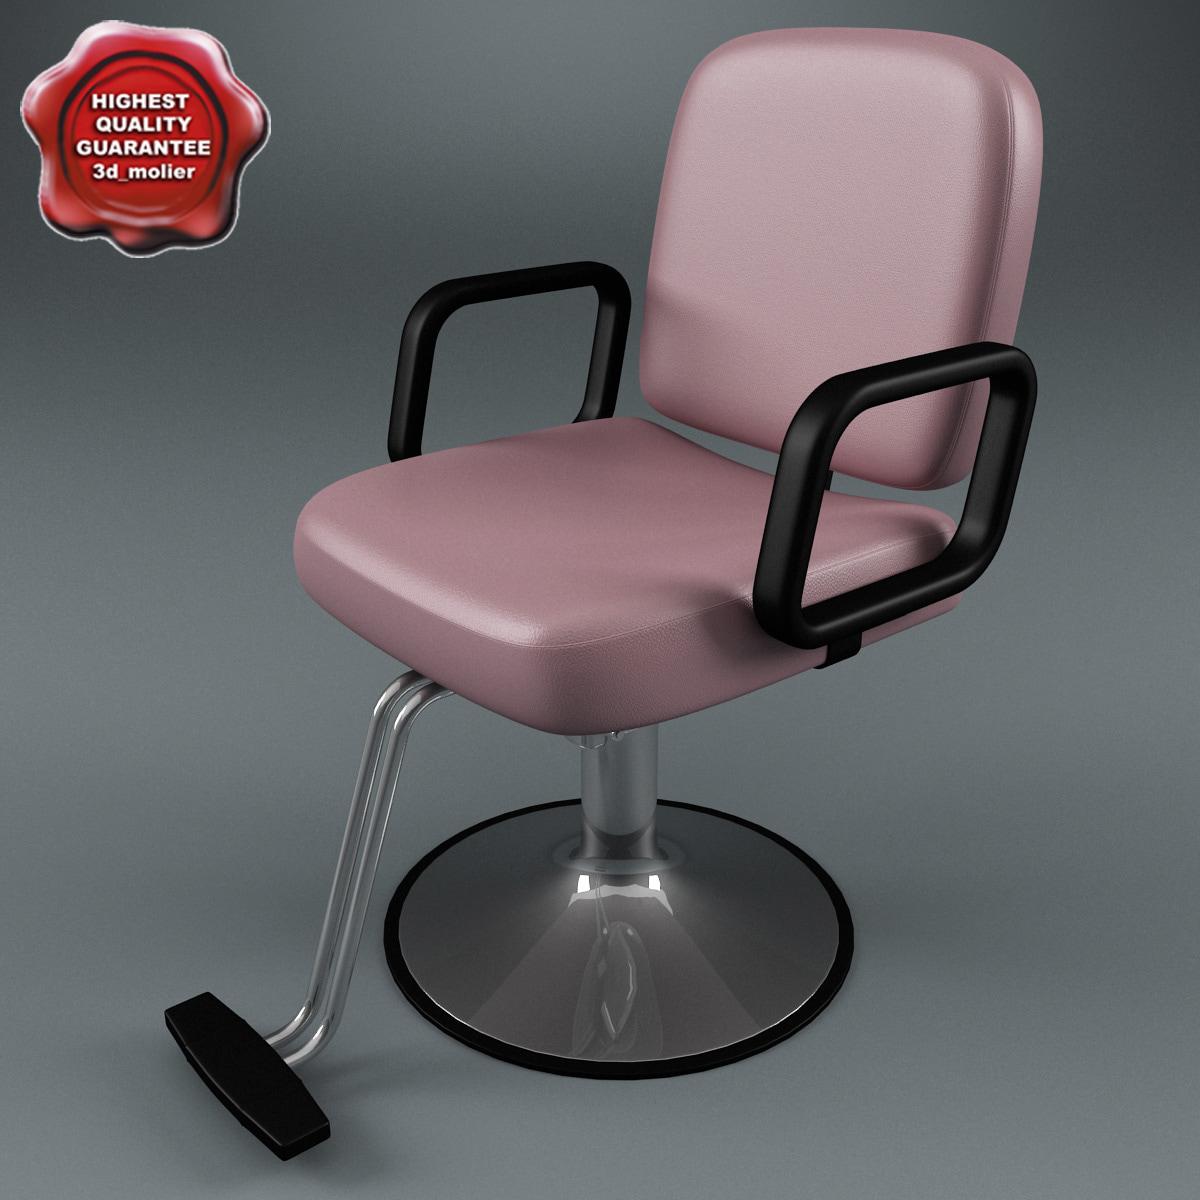 Salon_Chair_V2_00.jpg